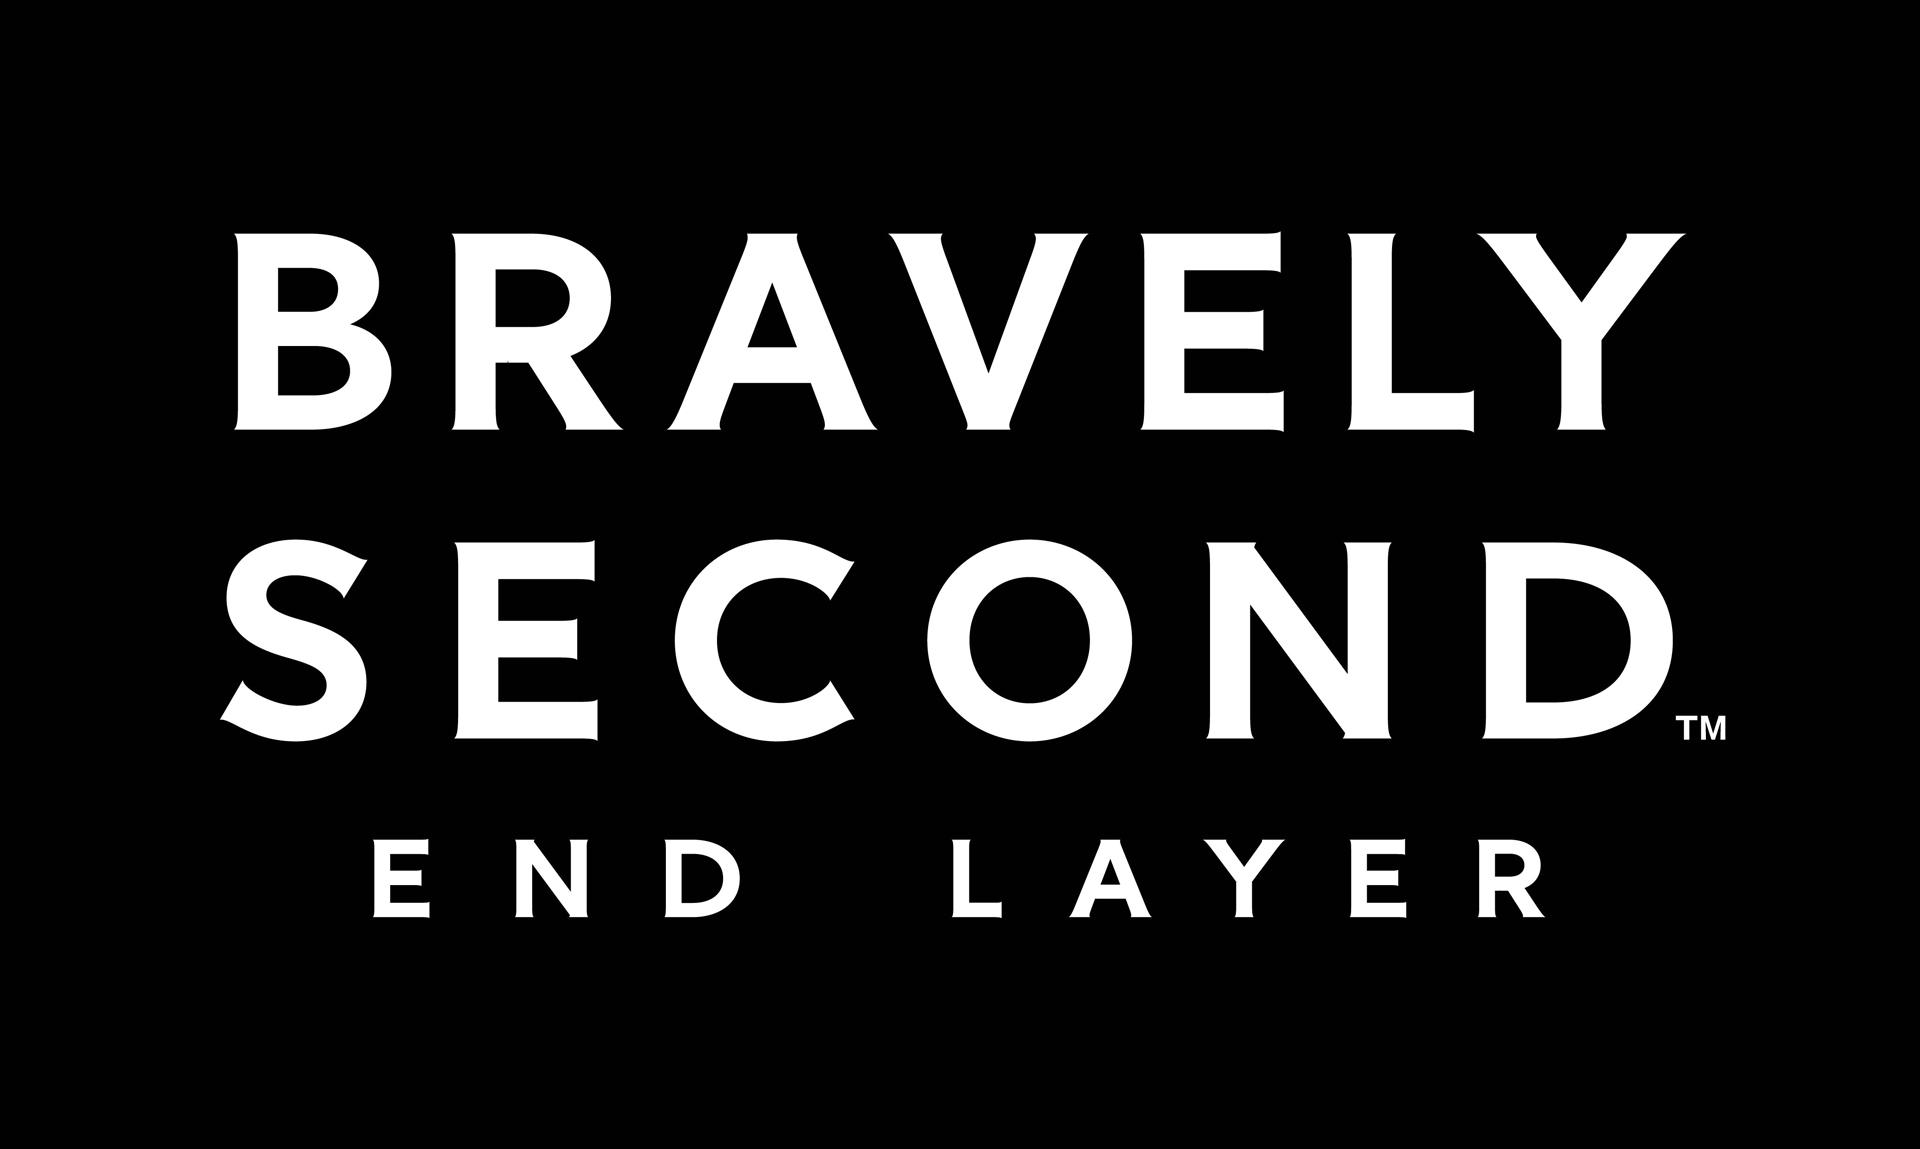 BravelySecond_Release-01